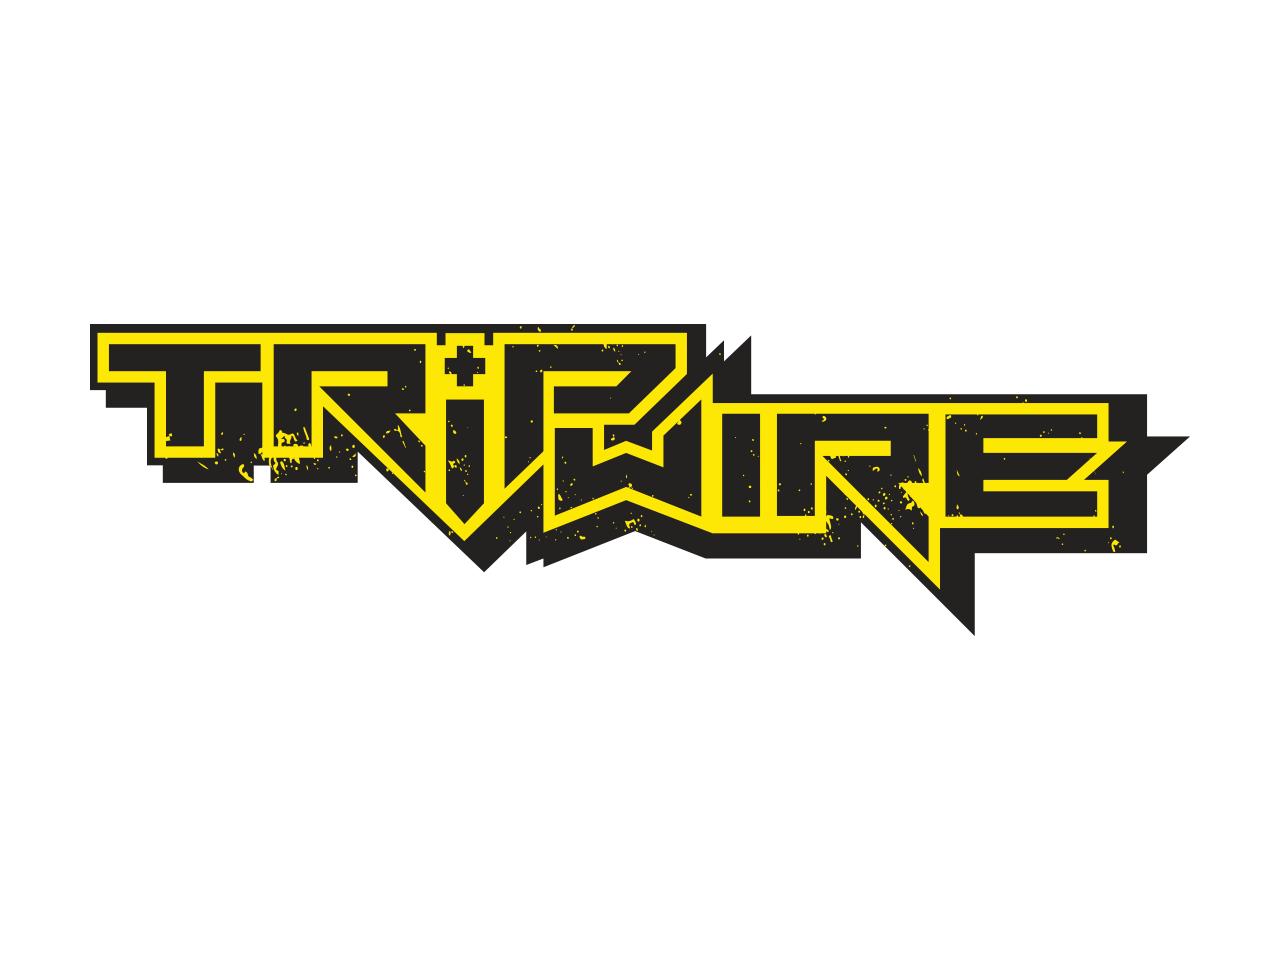 Tripwire Enterprise Product Review | SC Media